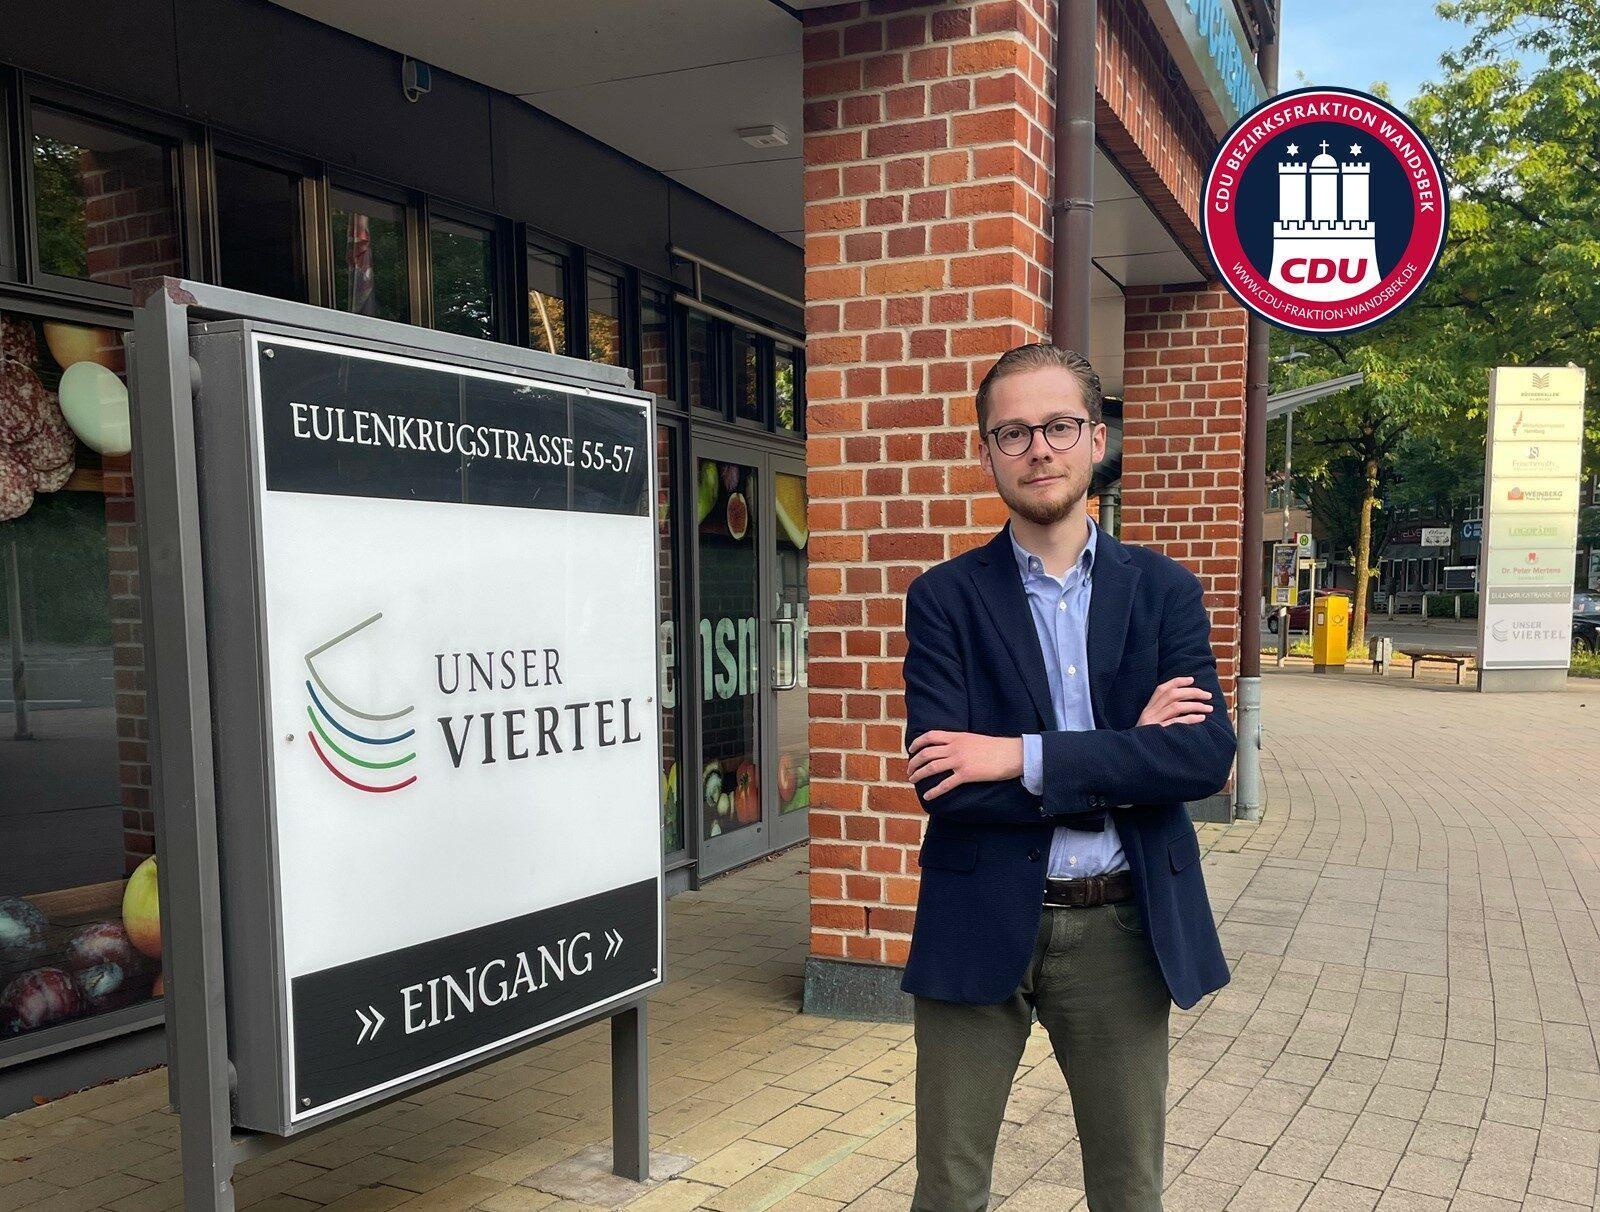 Kundenzentrum in Volksdorf